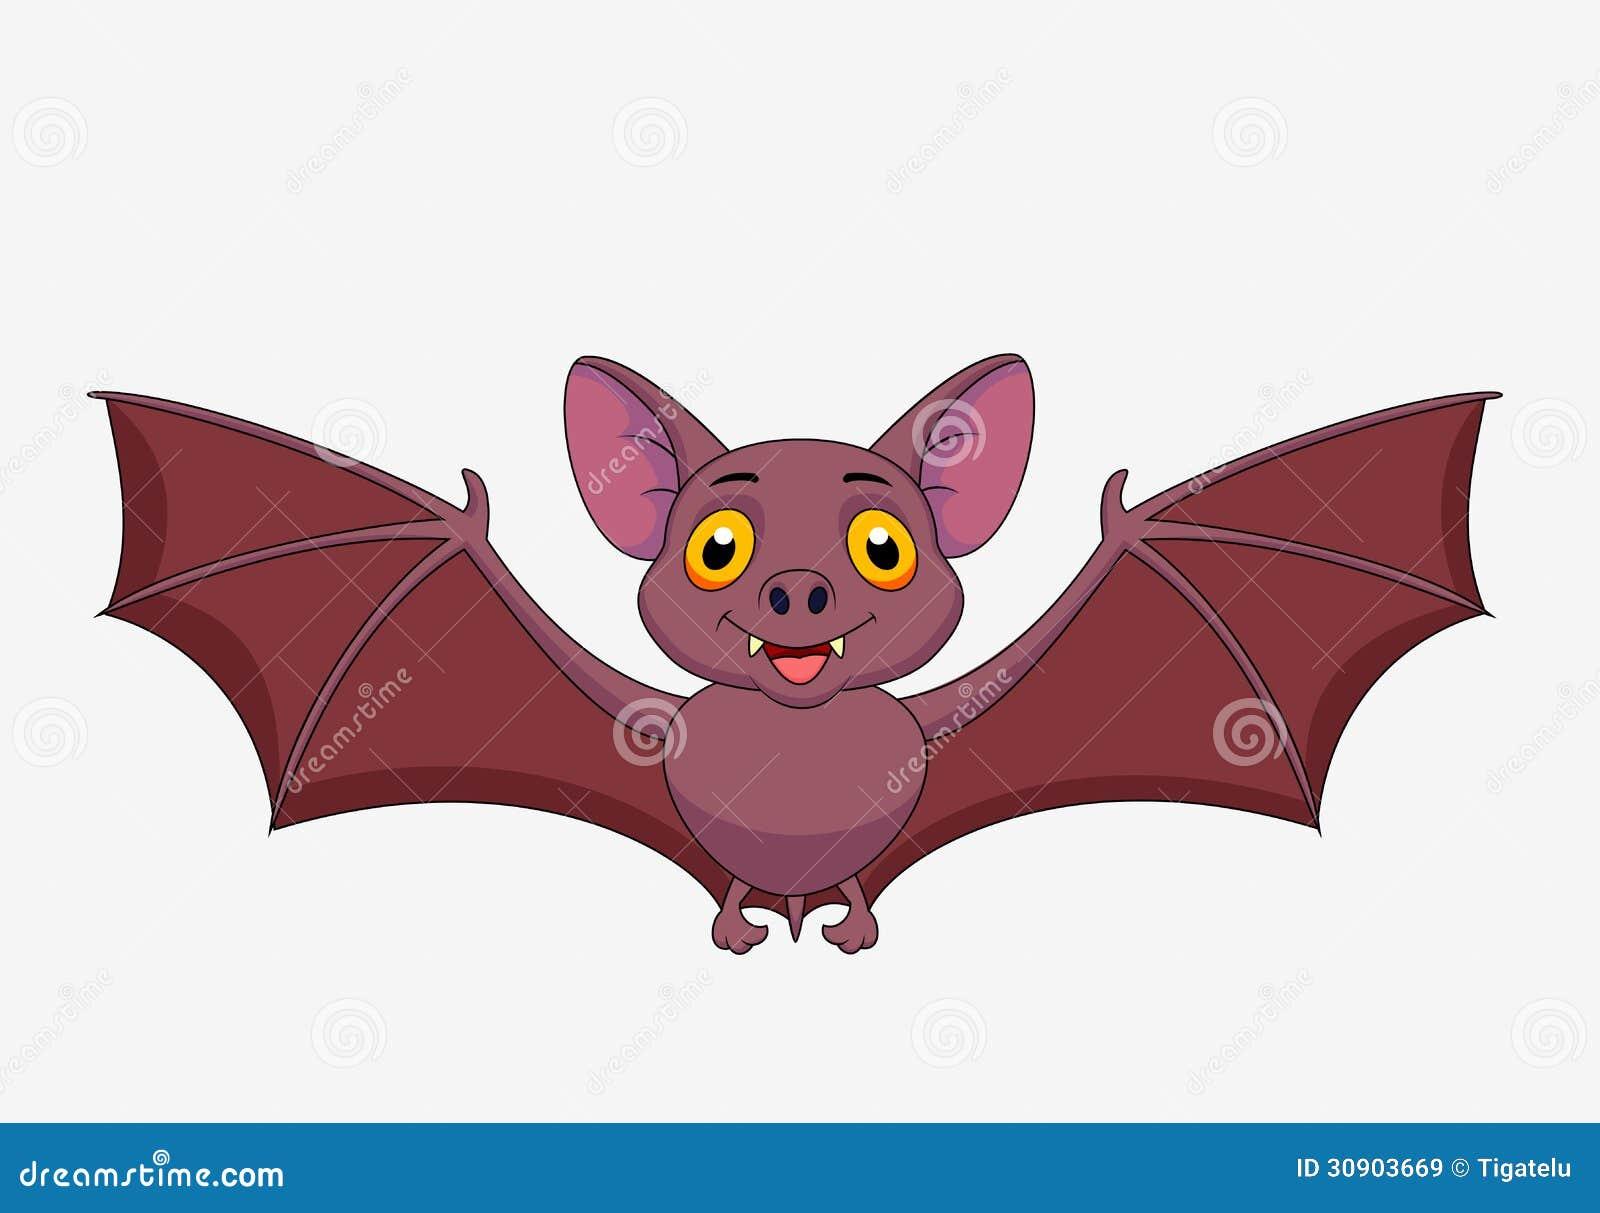 Bat Cartoon Flying Royalty Free Stock Images Image 30903669